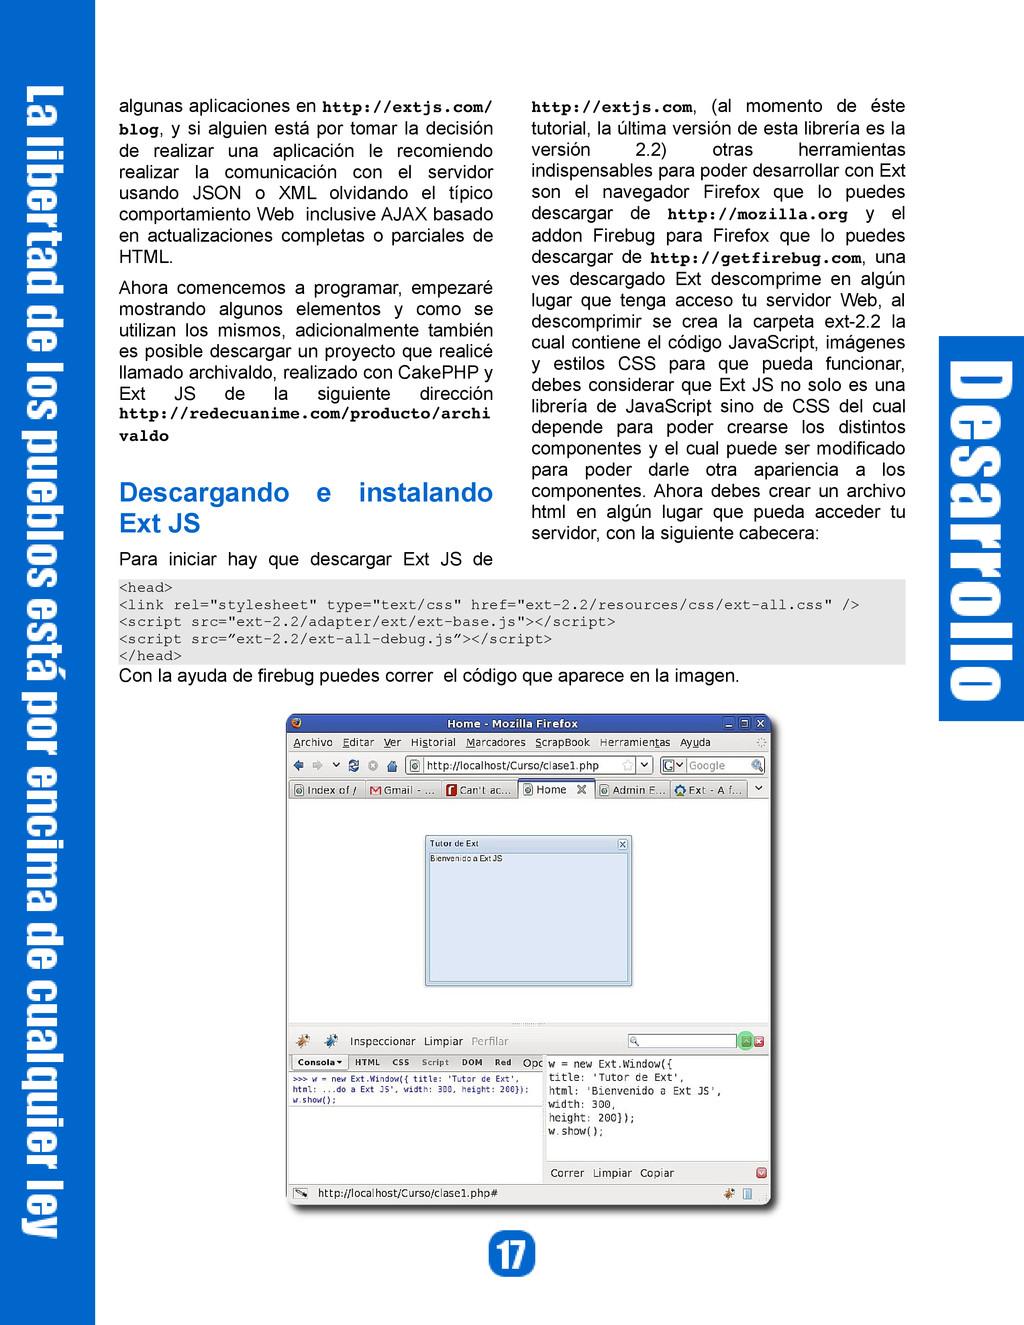 algunas aplicaciones en http://extjs.com/ blog,...